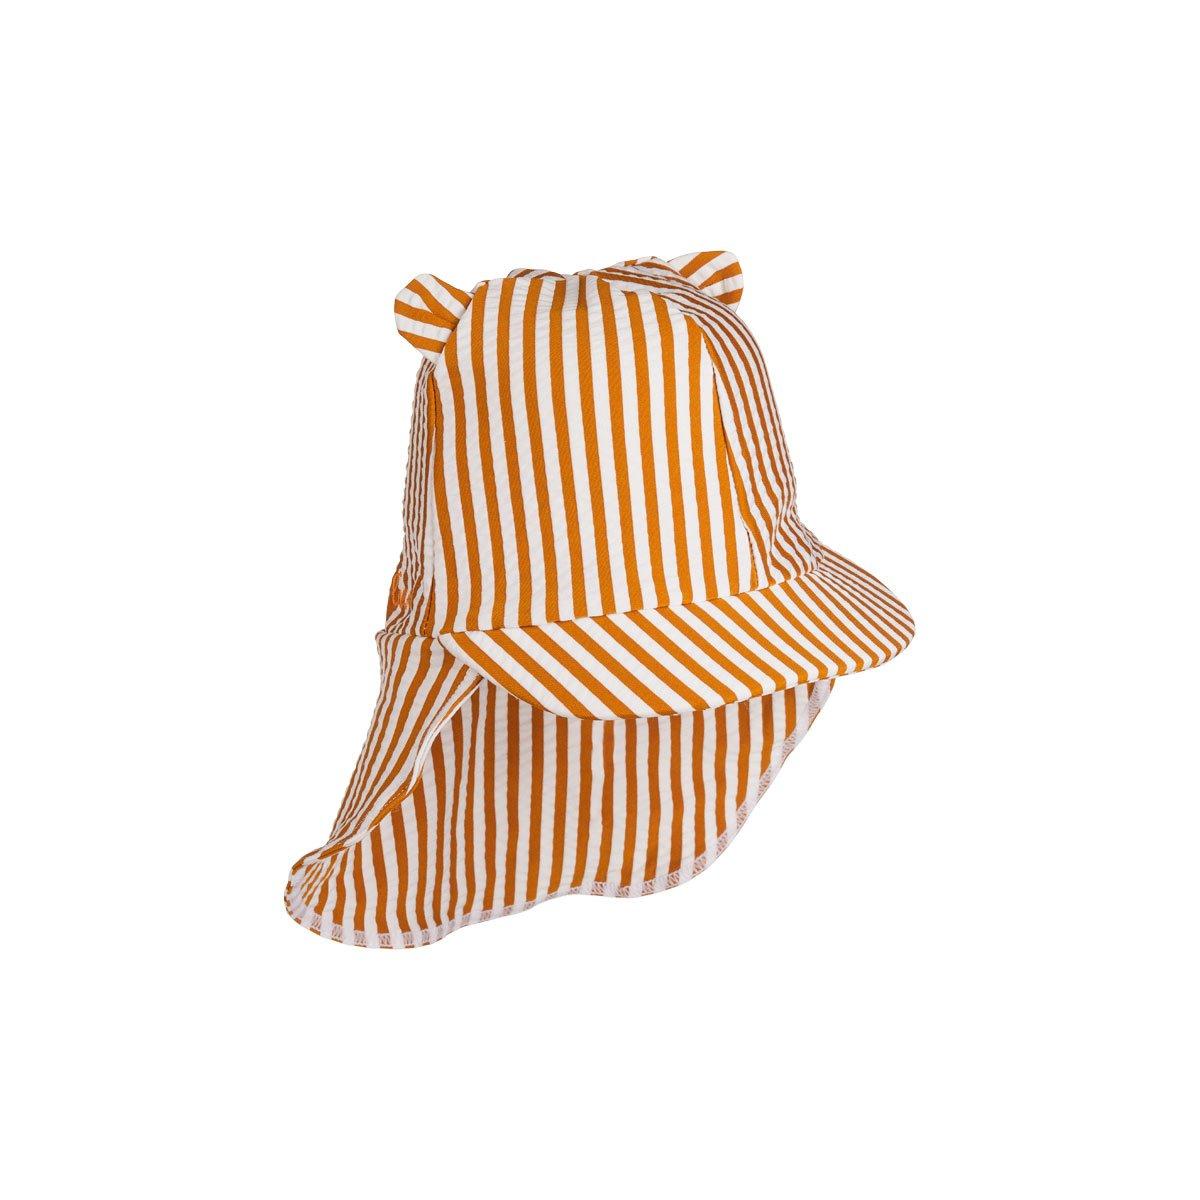 Senia sun hat seersucker - mustard / white